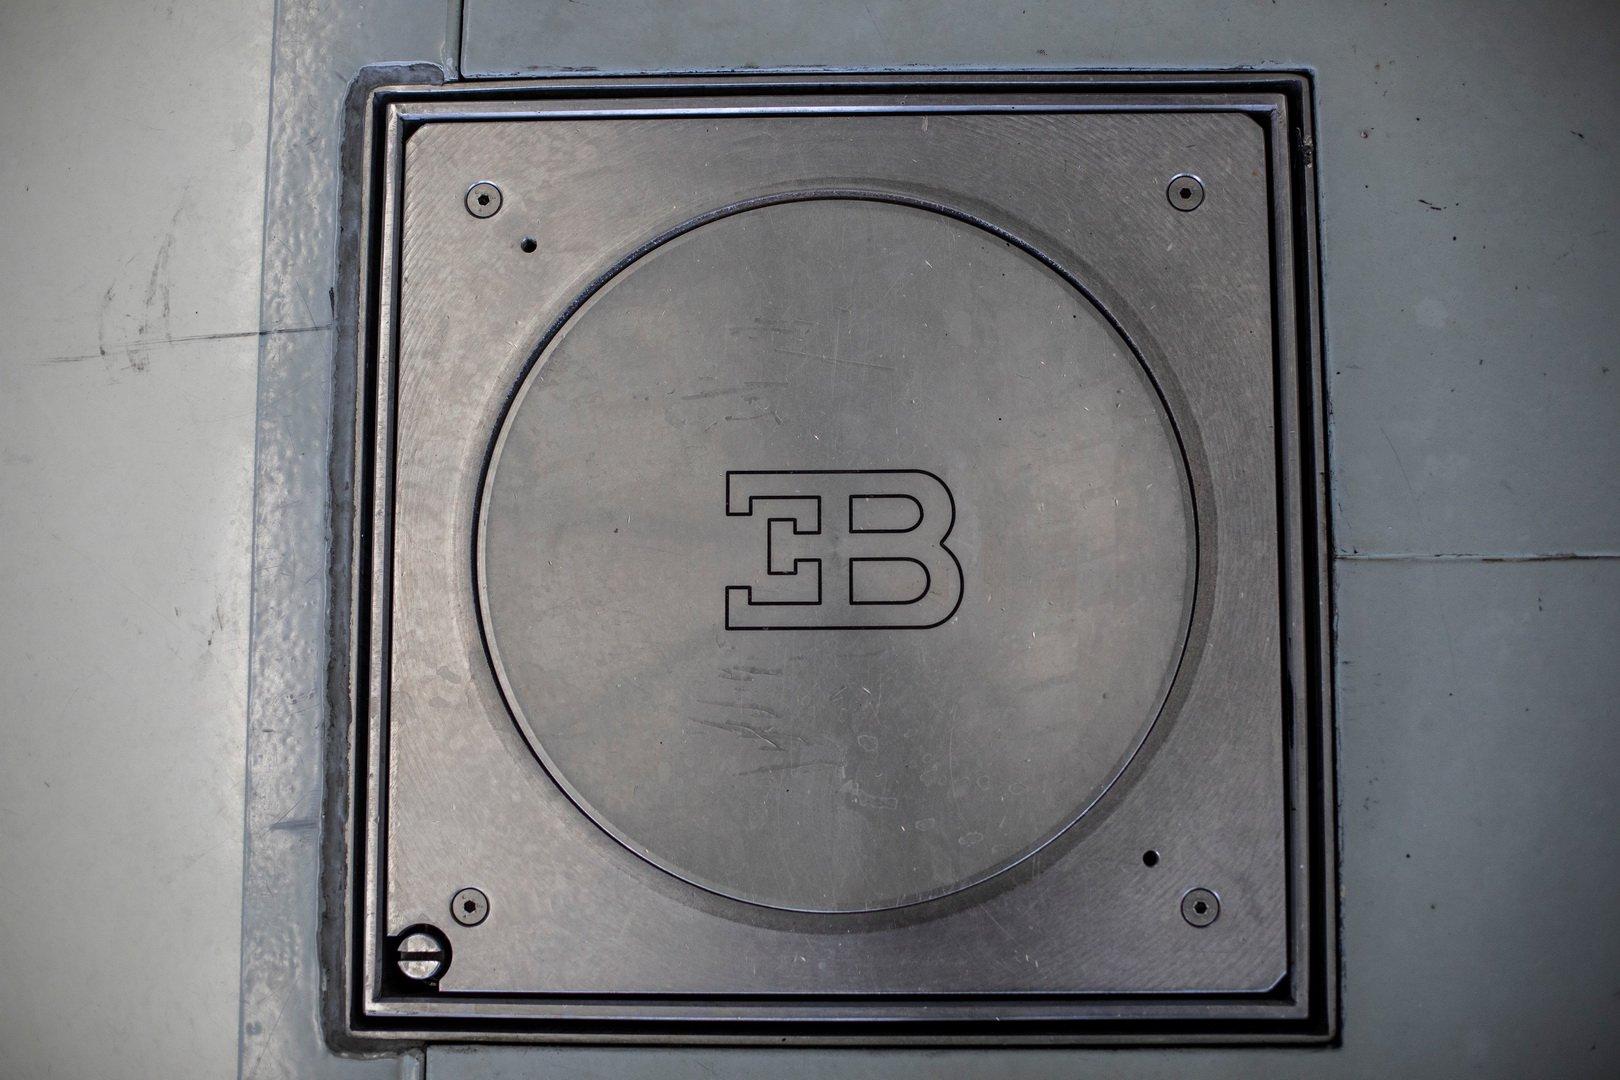 Bugatti-Chiron-Sport-110-Ans-Bugatti-production-plant-26